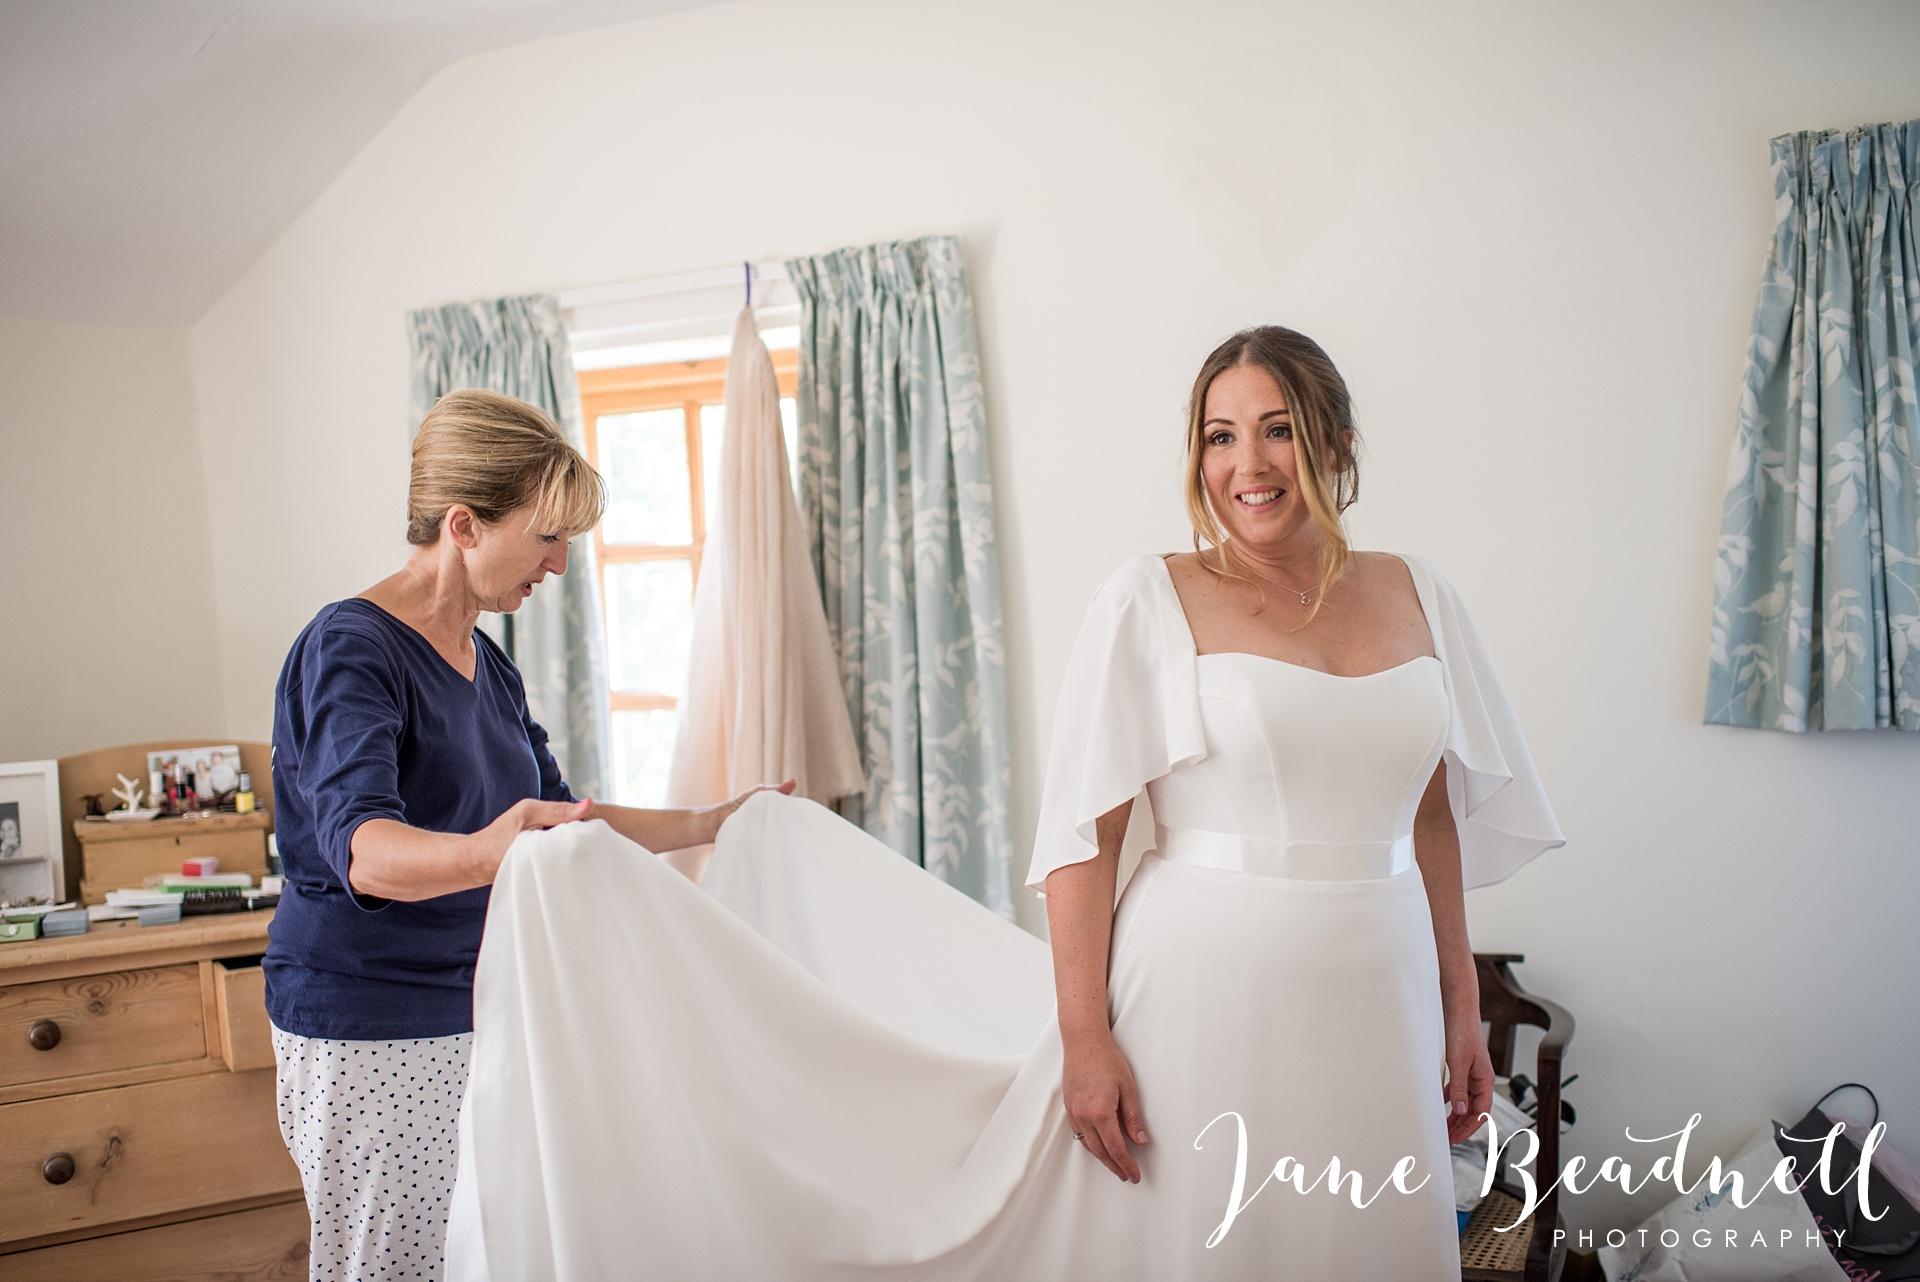 fine-art-wedding-photographer-jane-beadnell-yorkshire-wedding-photographer_0022